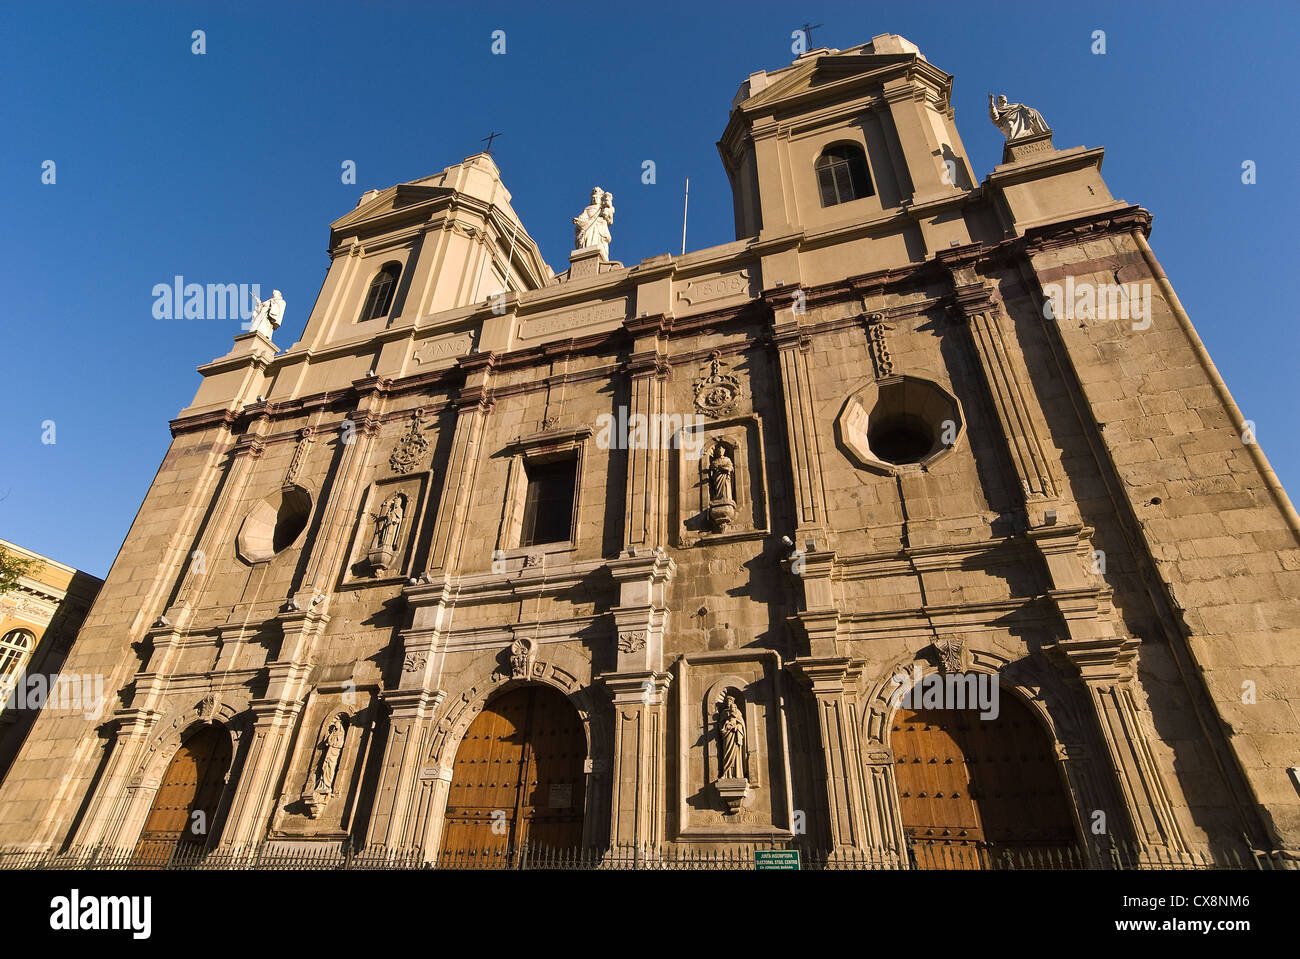 Elk198-1077 Chile, Santiago, Iglesia Santo Domingo church - Stock Image